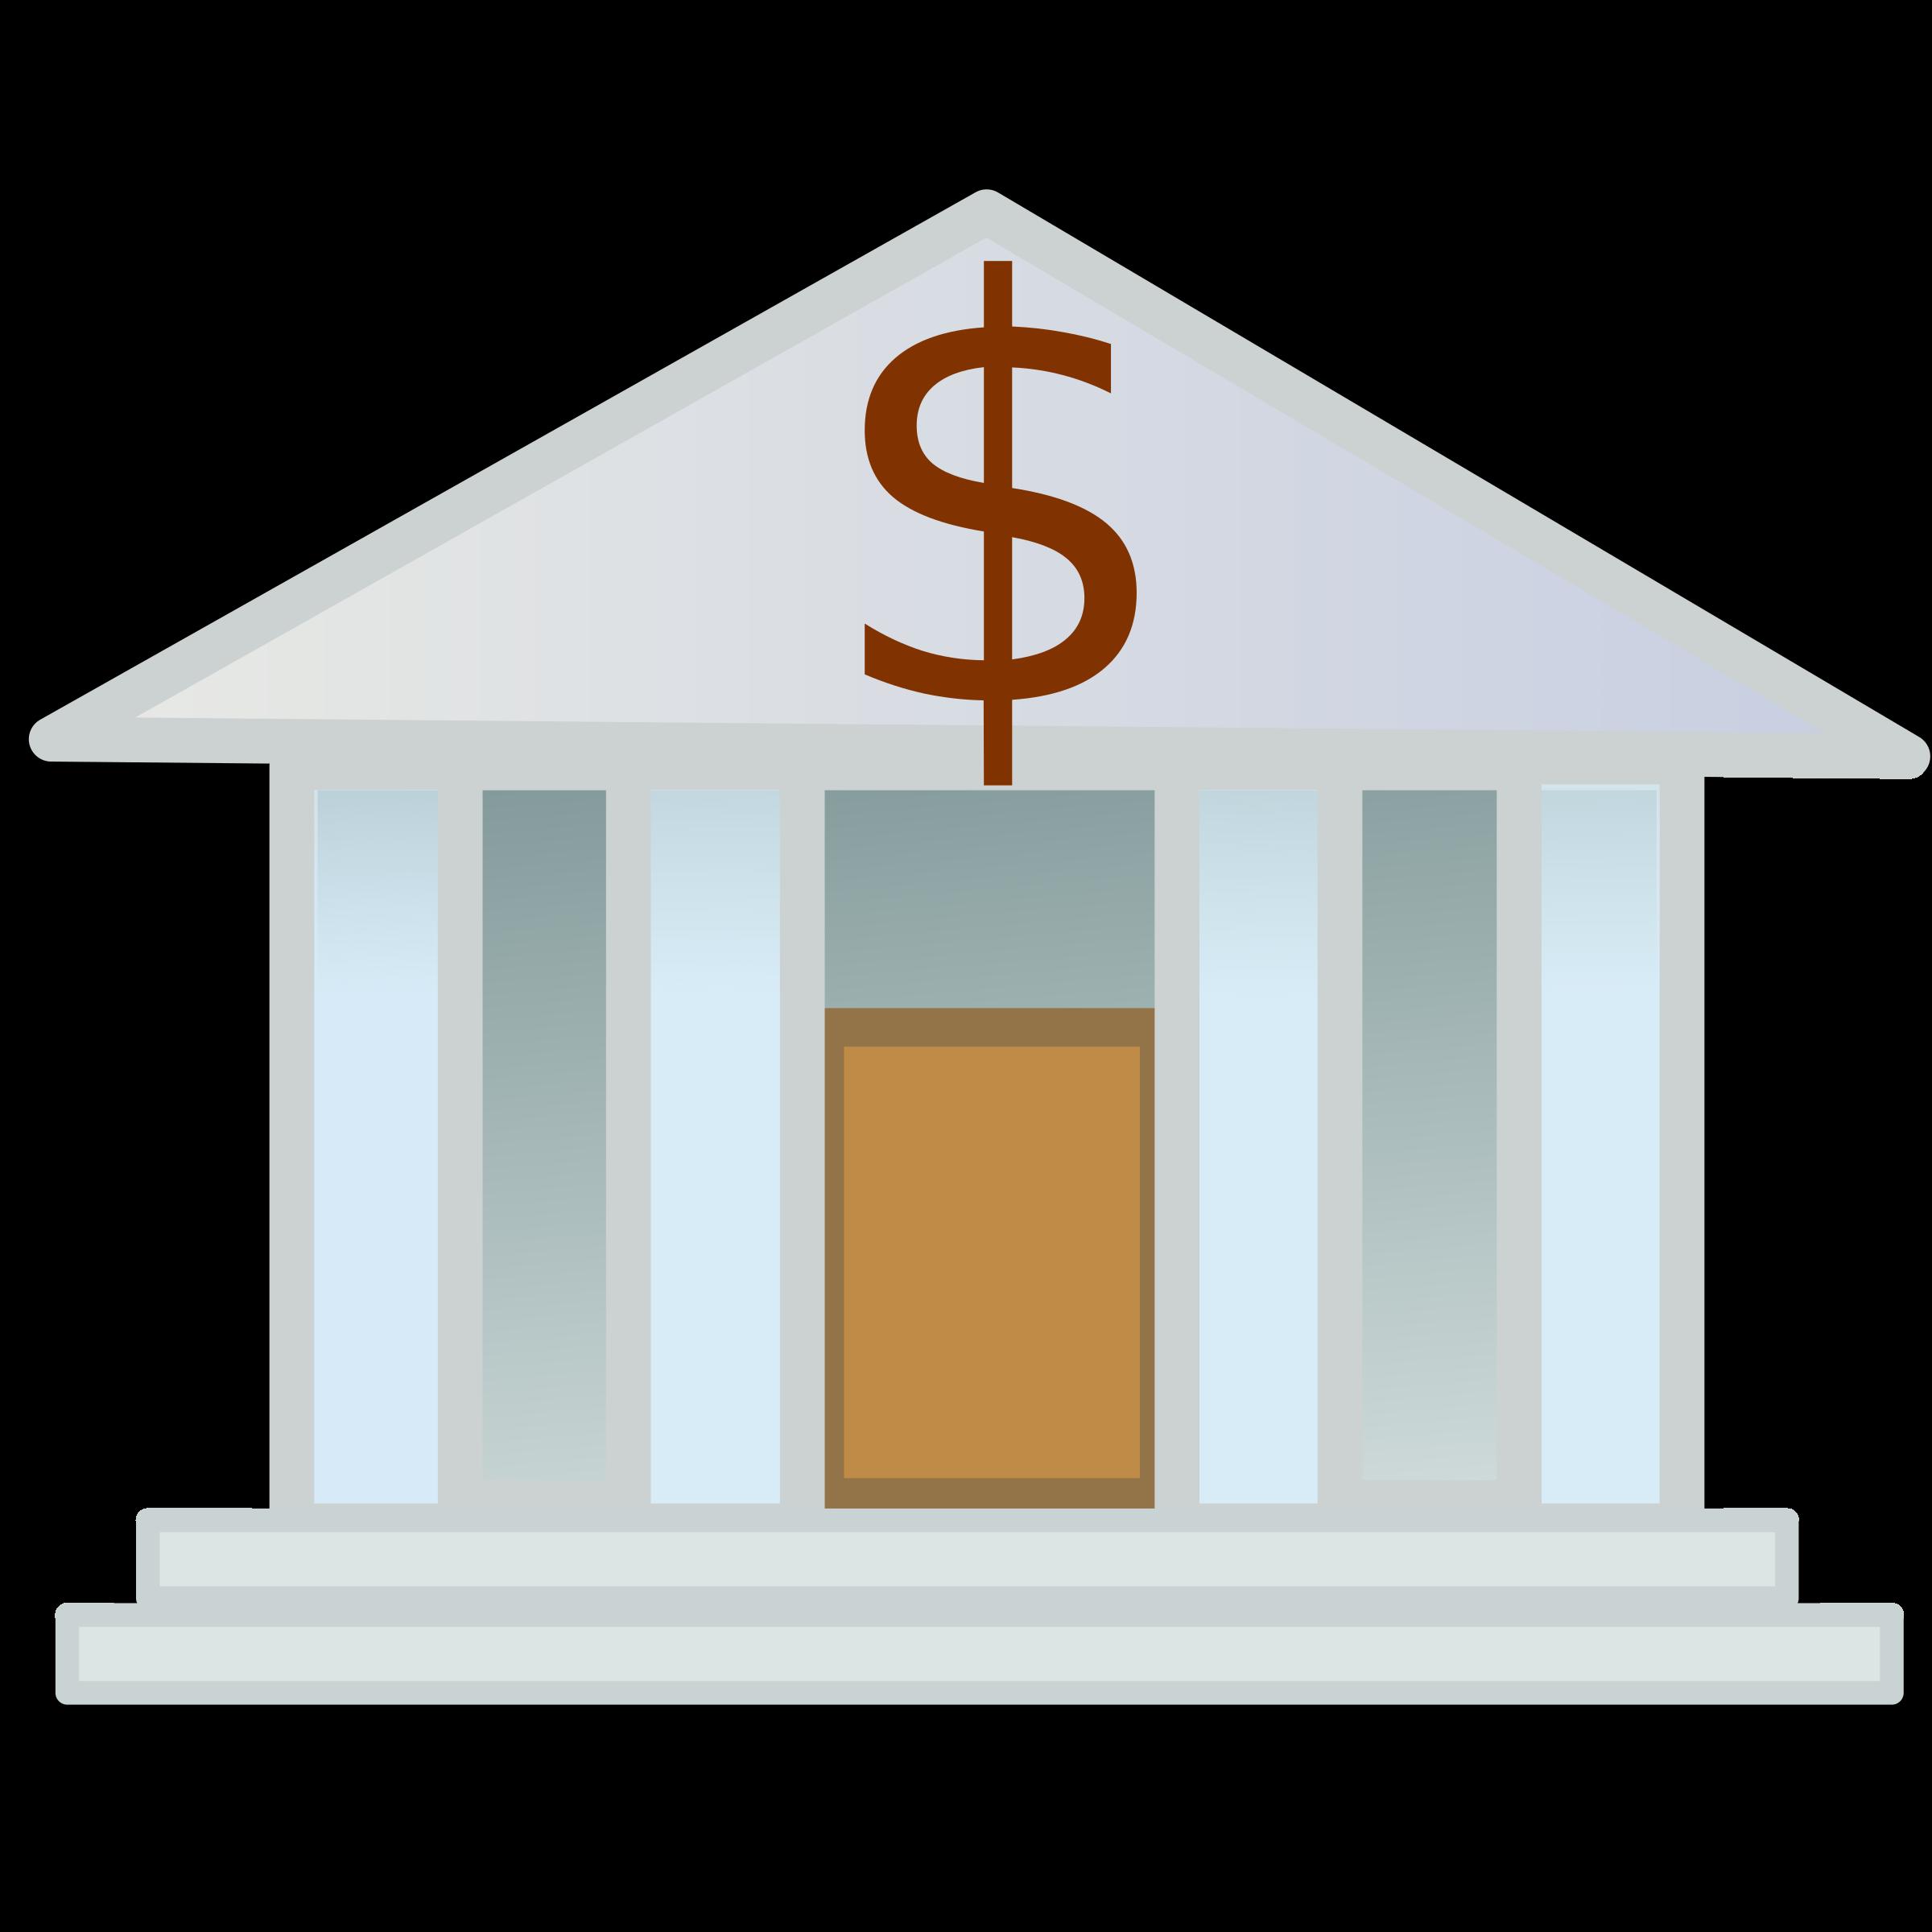 Dollar clipart supreme. Bank building panda free